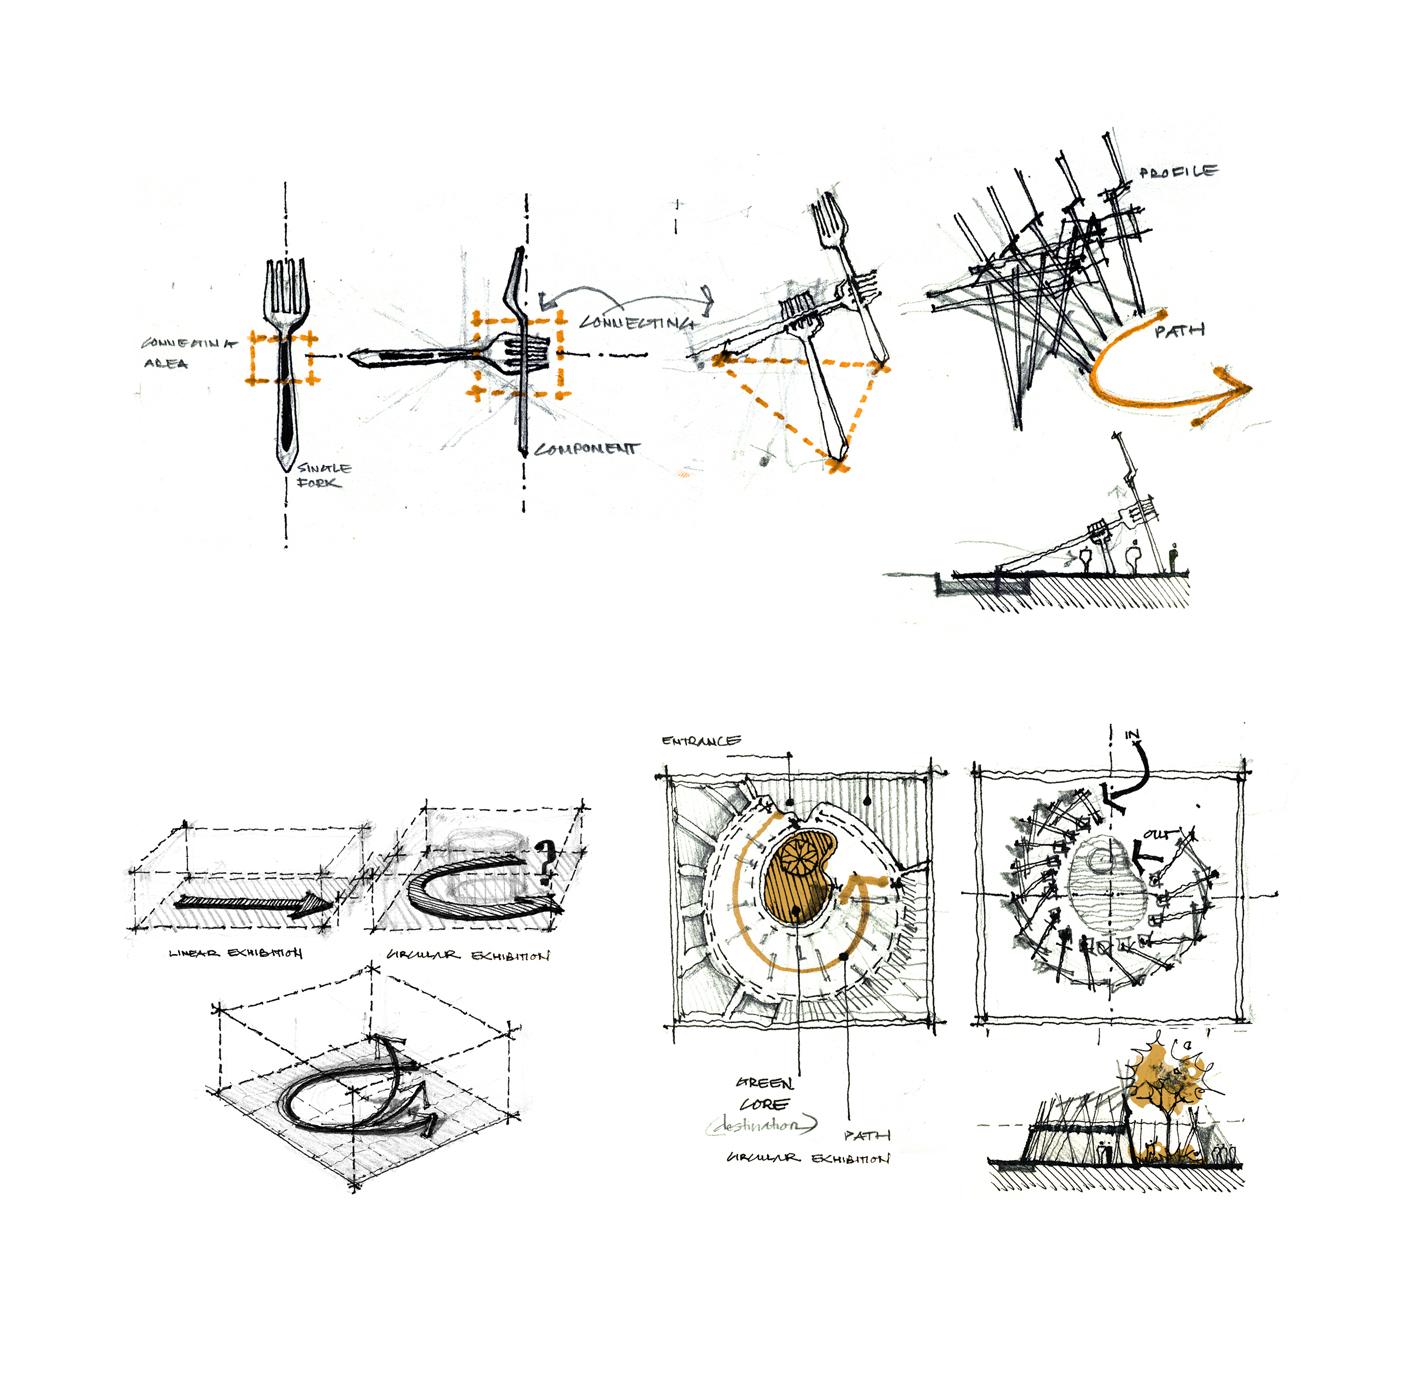 Khoa Vu Transformation Plastic sketching #001.jpg